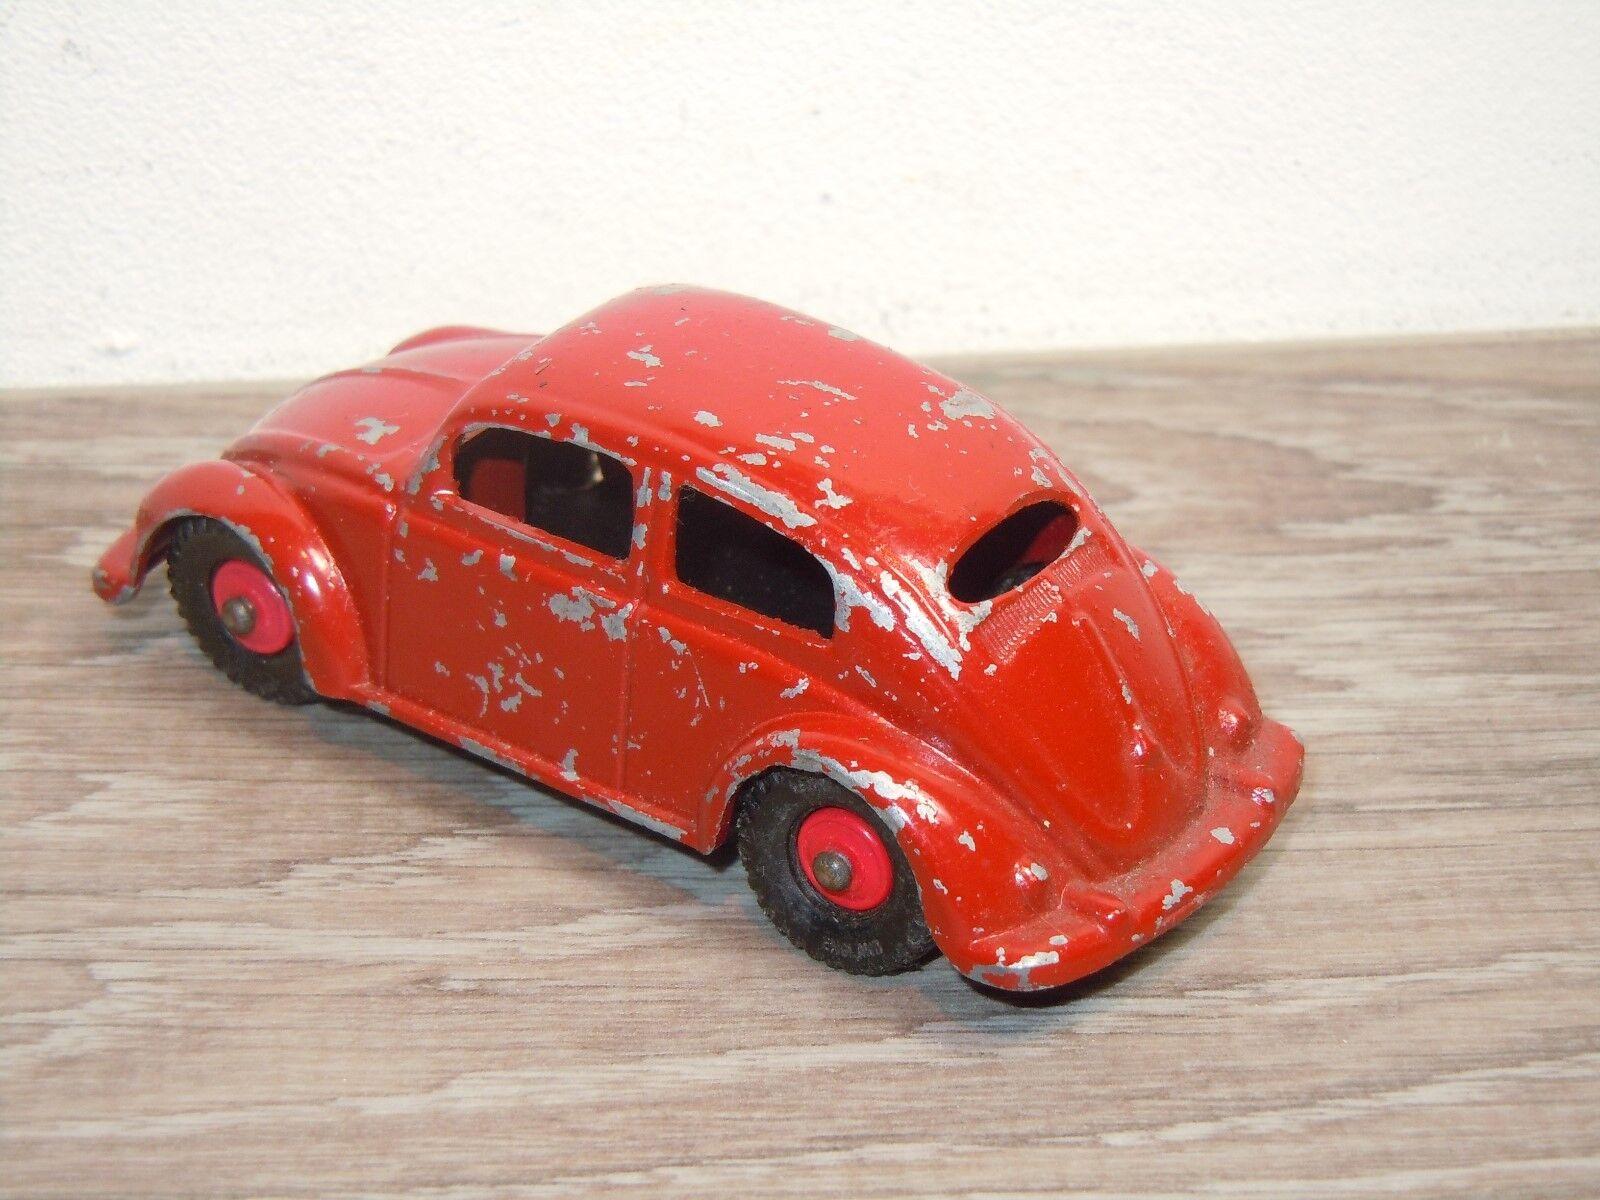 VW VW VW Volkswagen Beetle Oval Window - Sweering Holland - Made in Germany 35900 4371ca